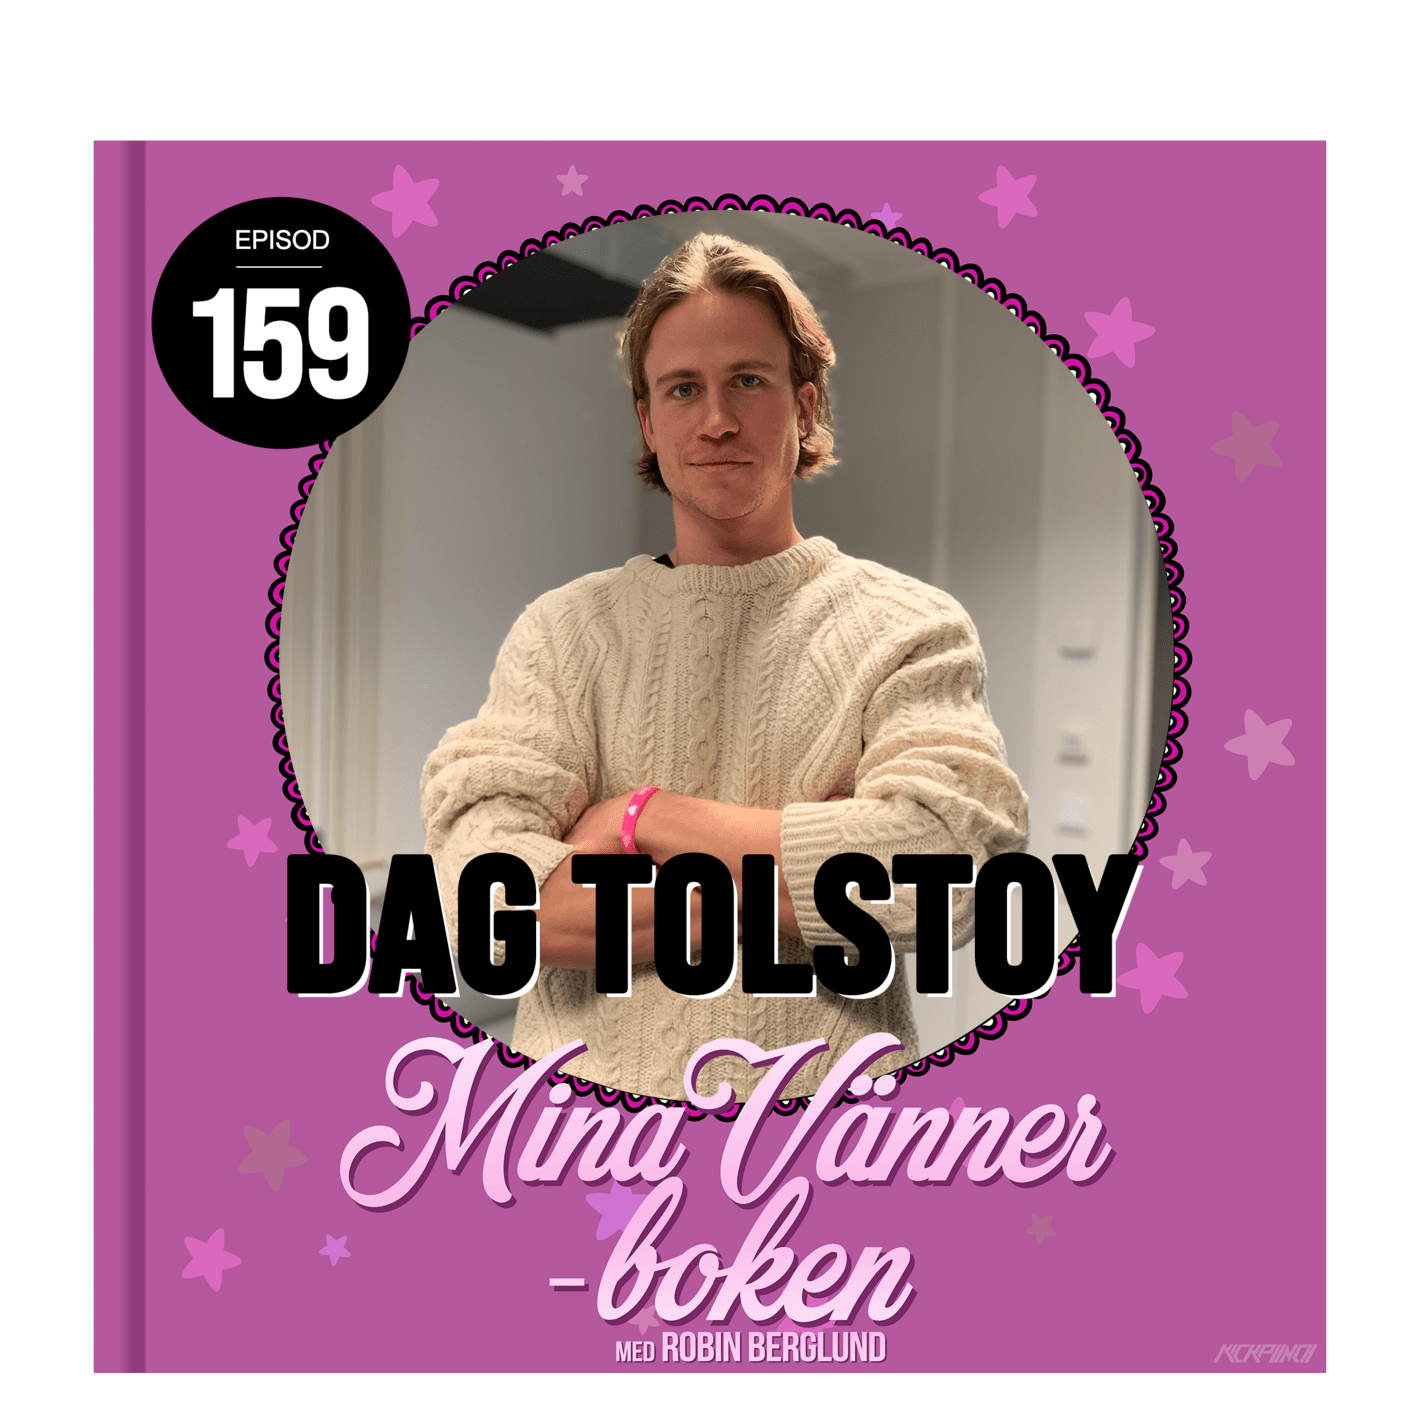 159. Dag Tolstoy